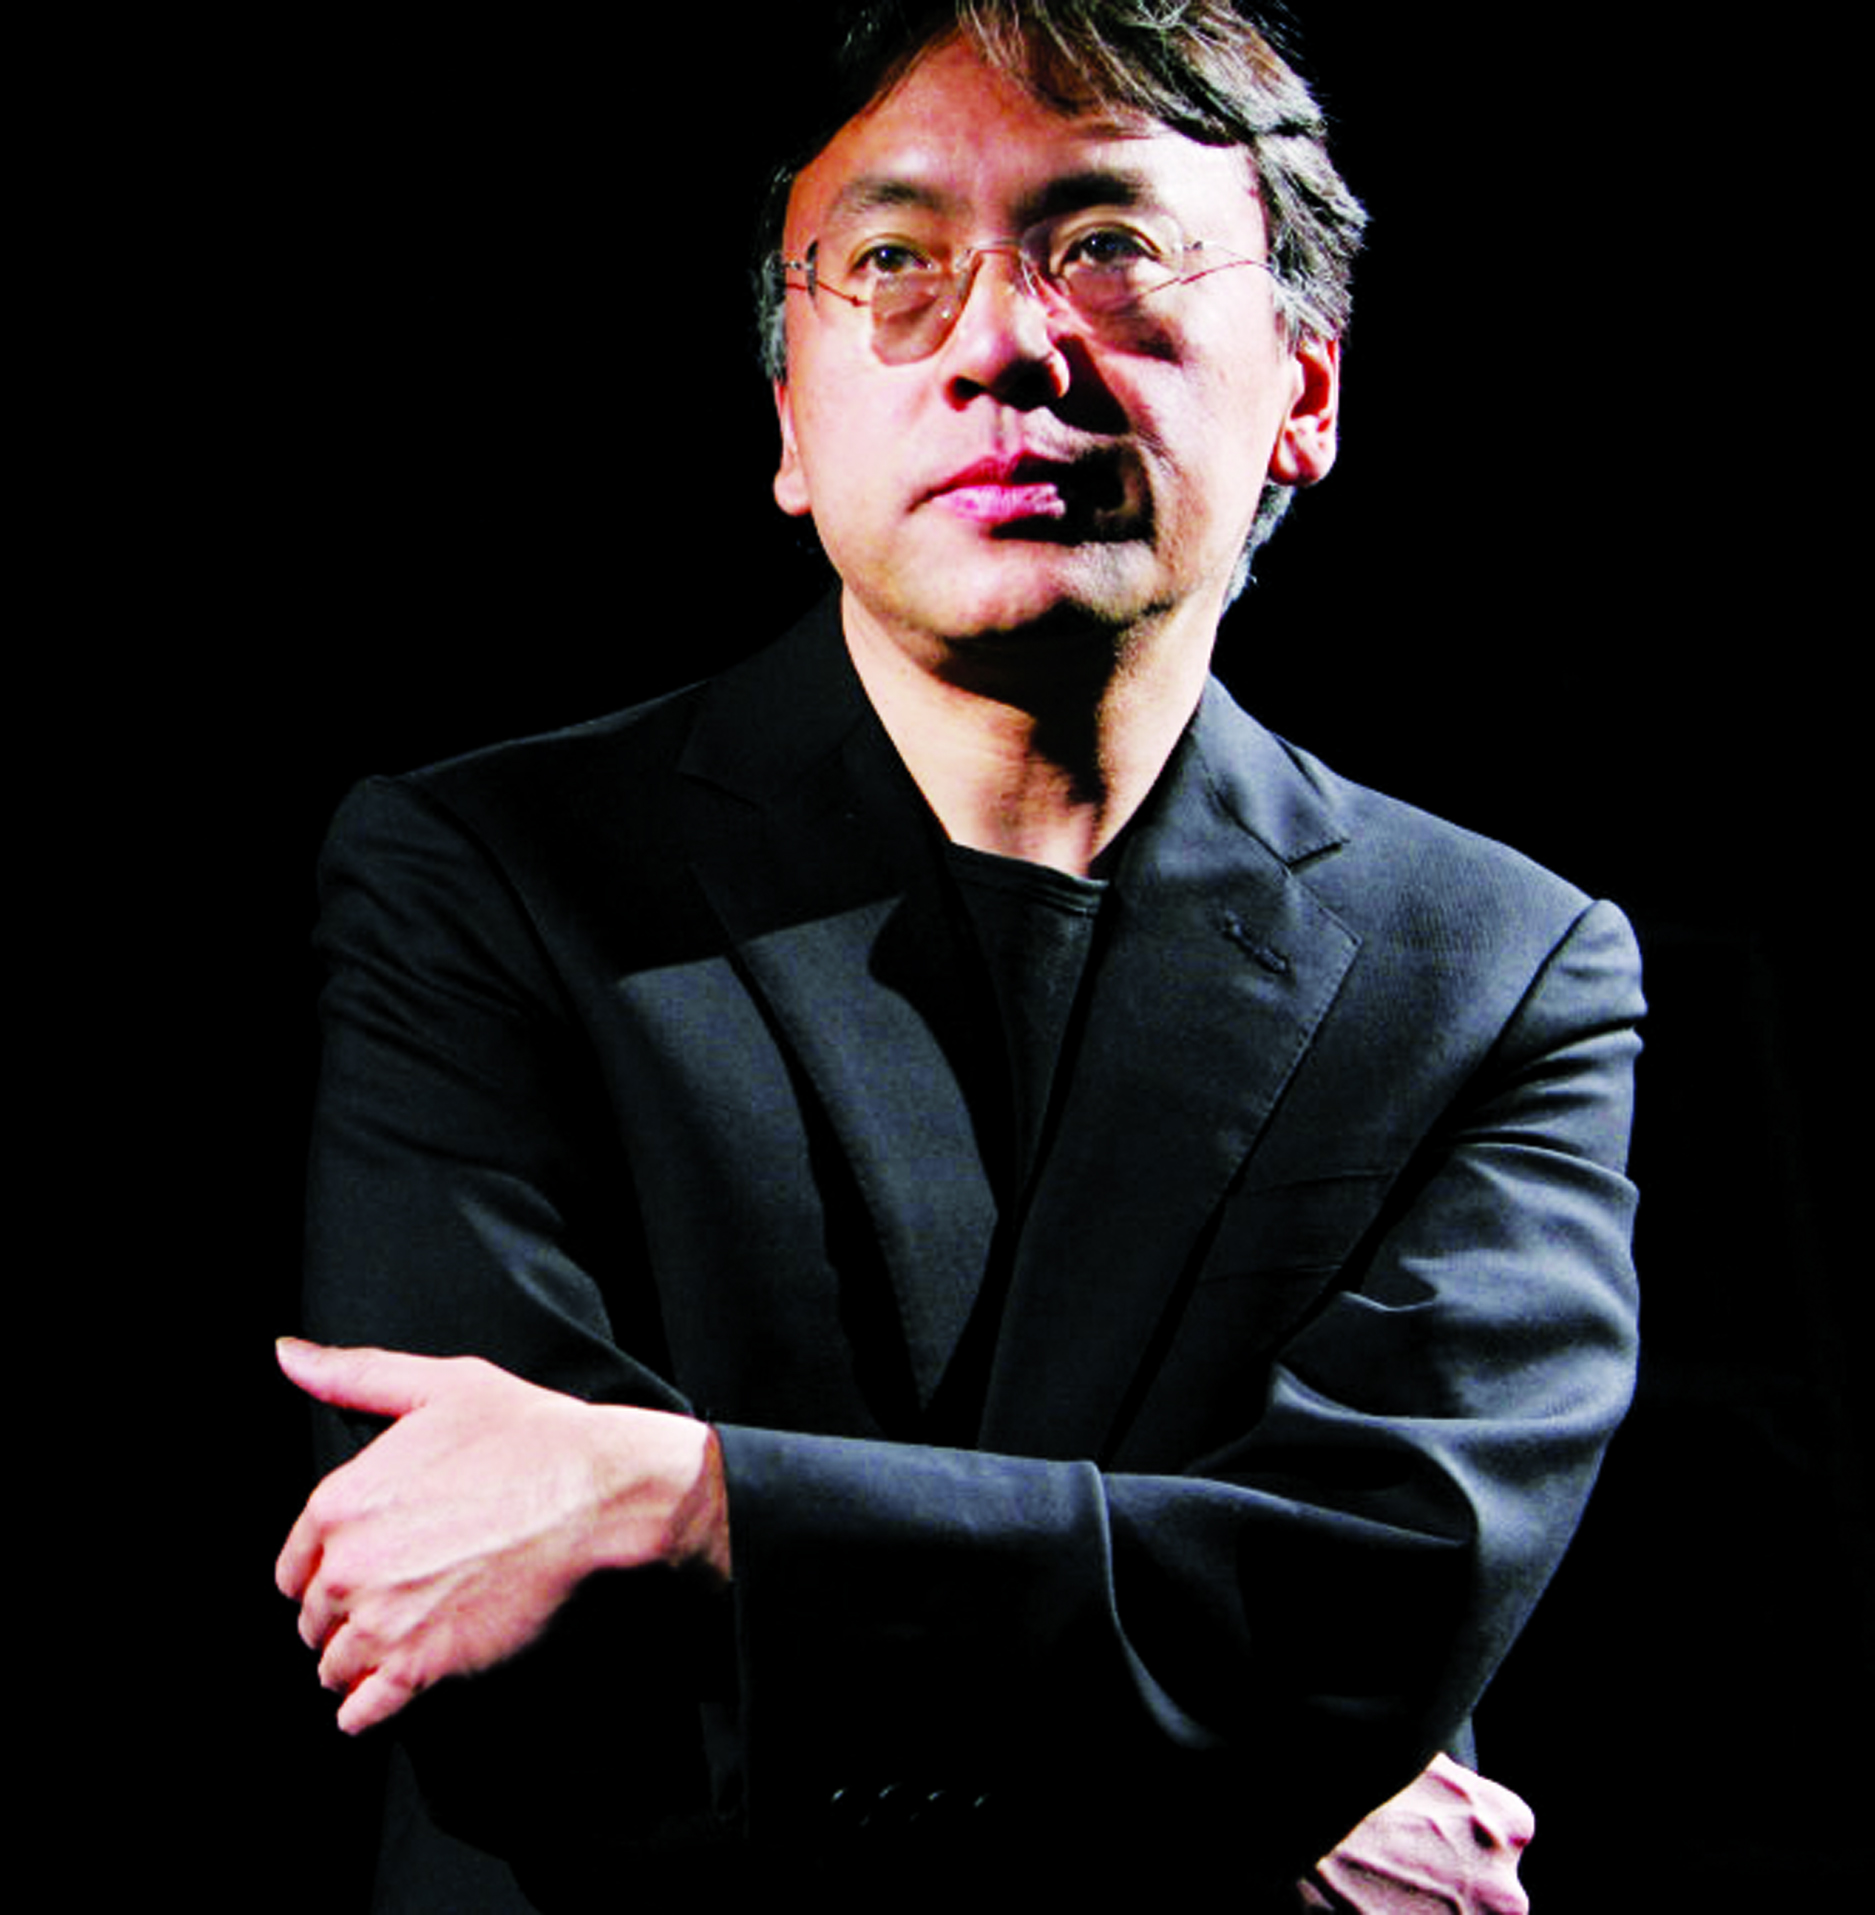 Novelist Kazuo Ishiguro